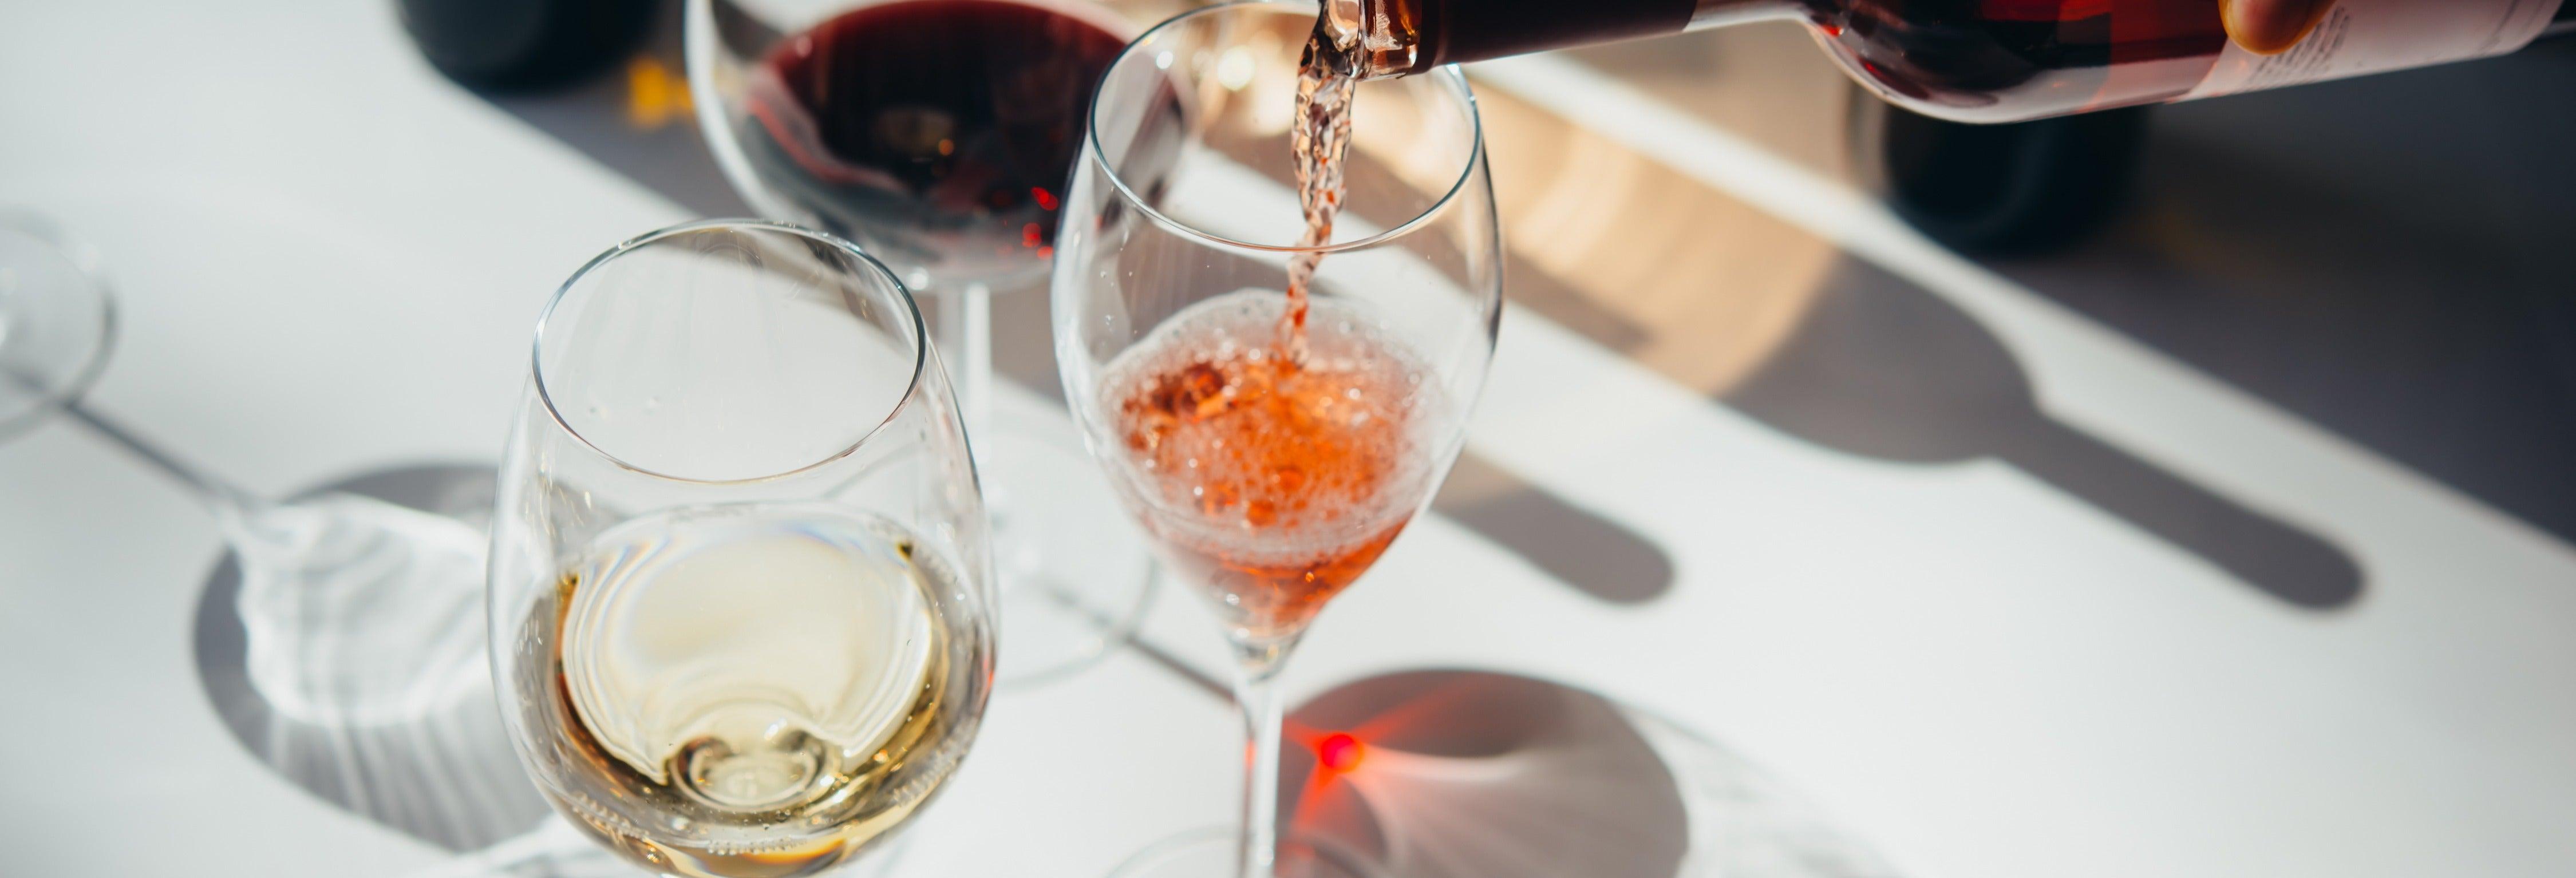 Degustazione di vino a Trieste